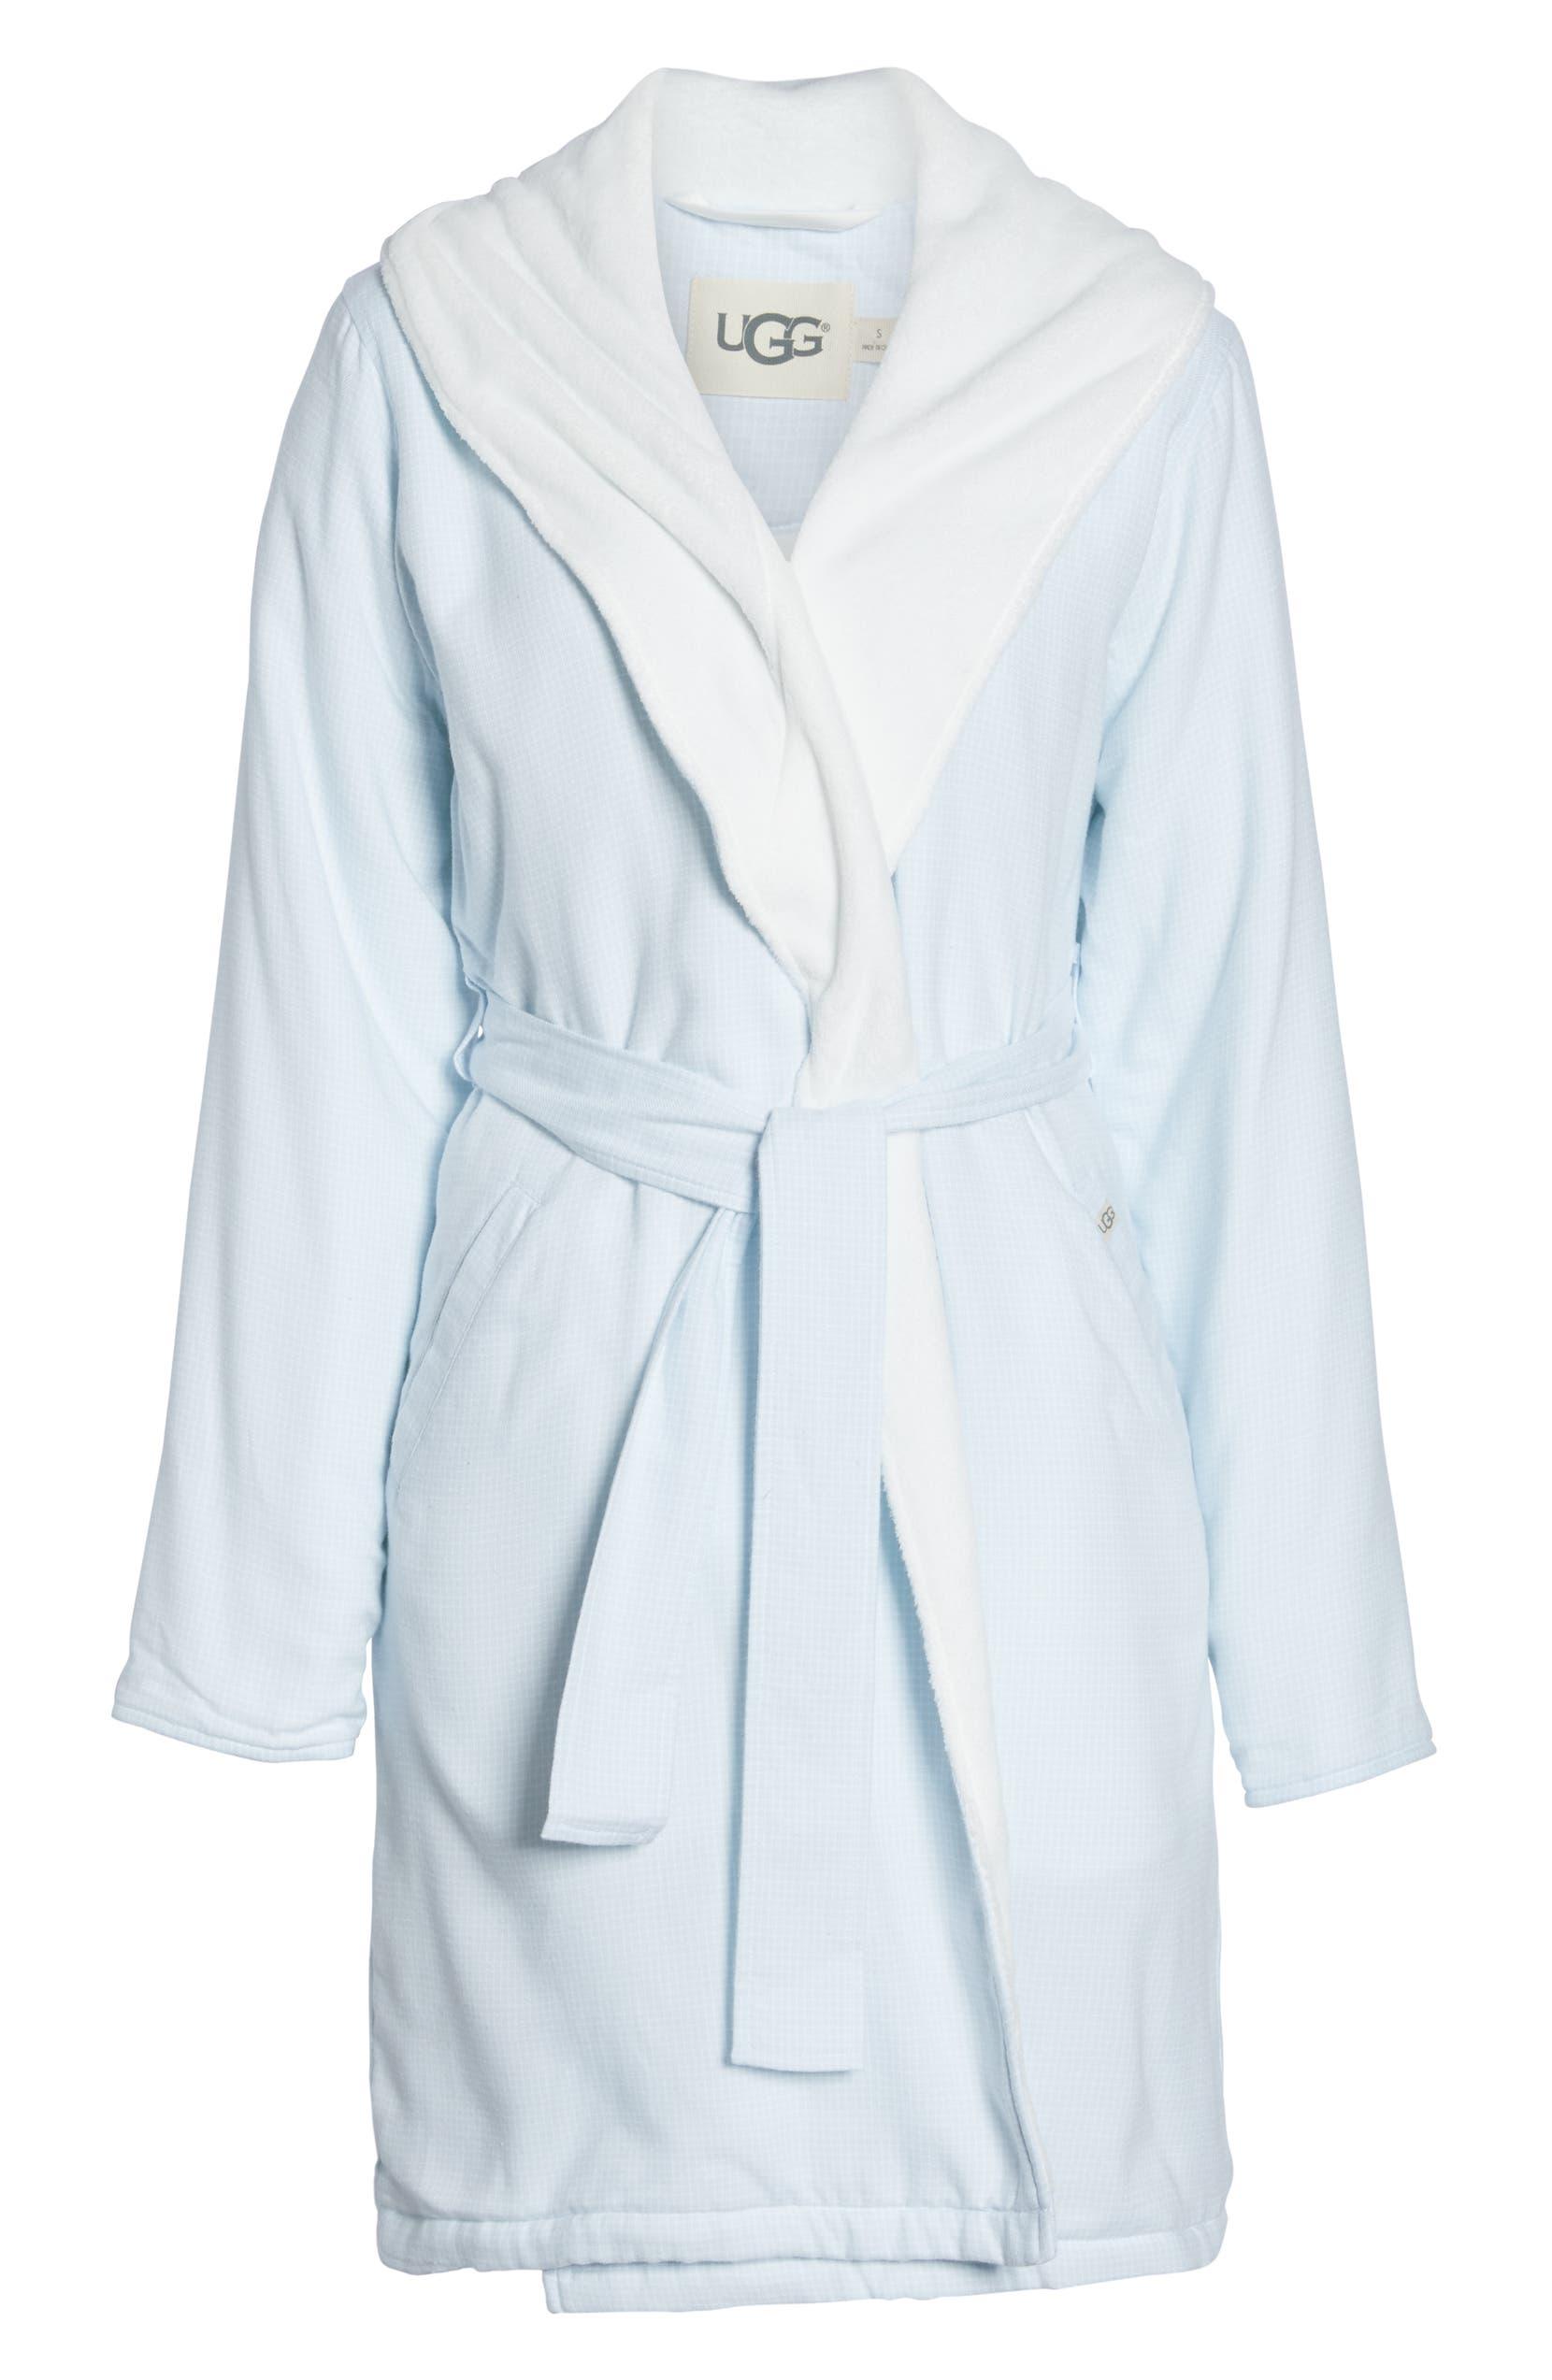 3ebf3087f1 UGG® Anika Fleece Lined Flannel Robe